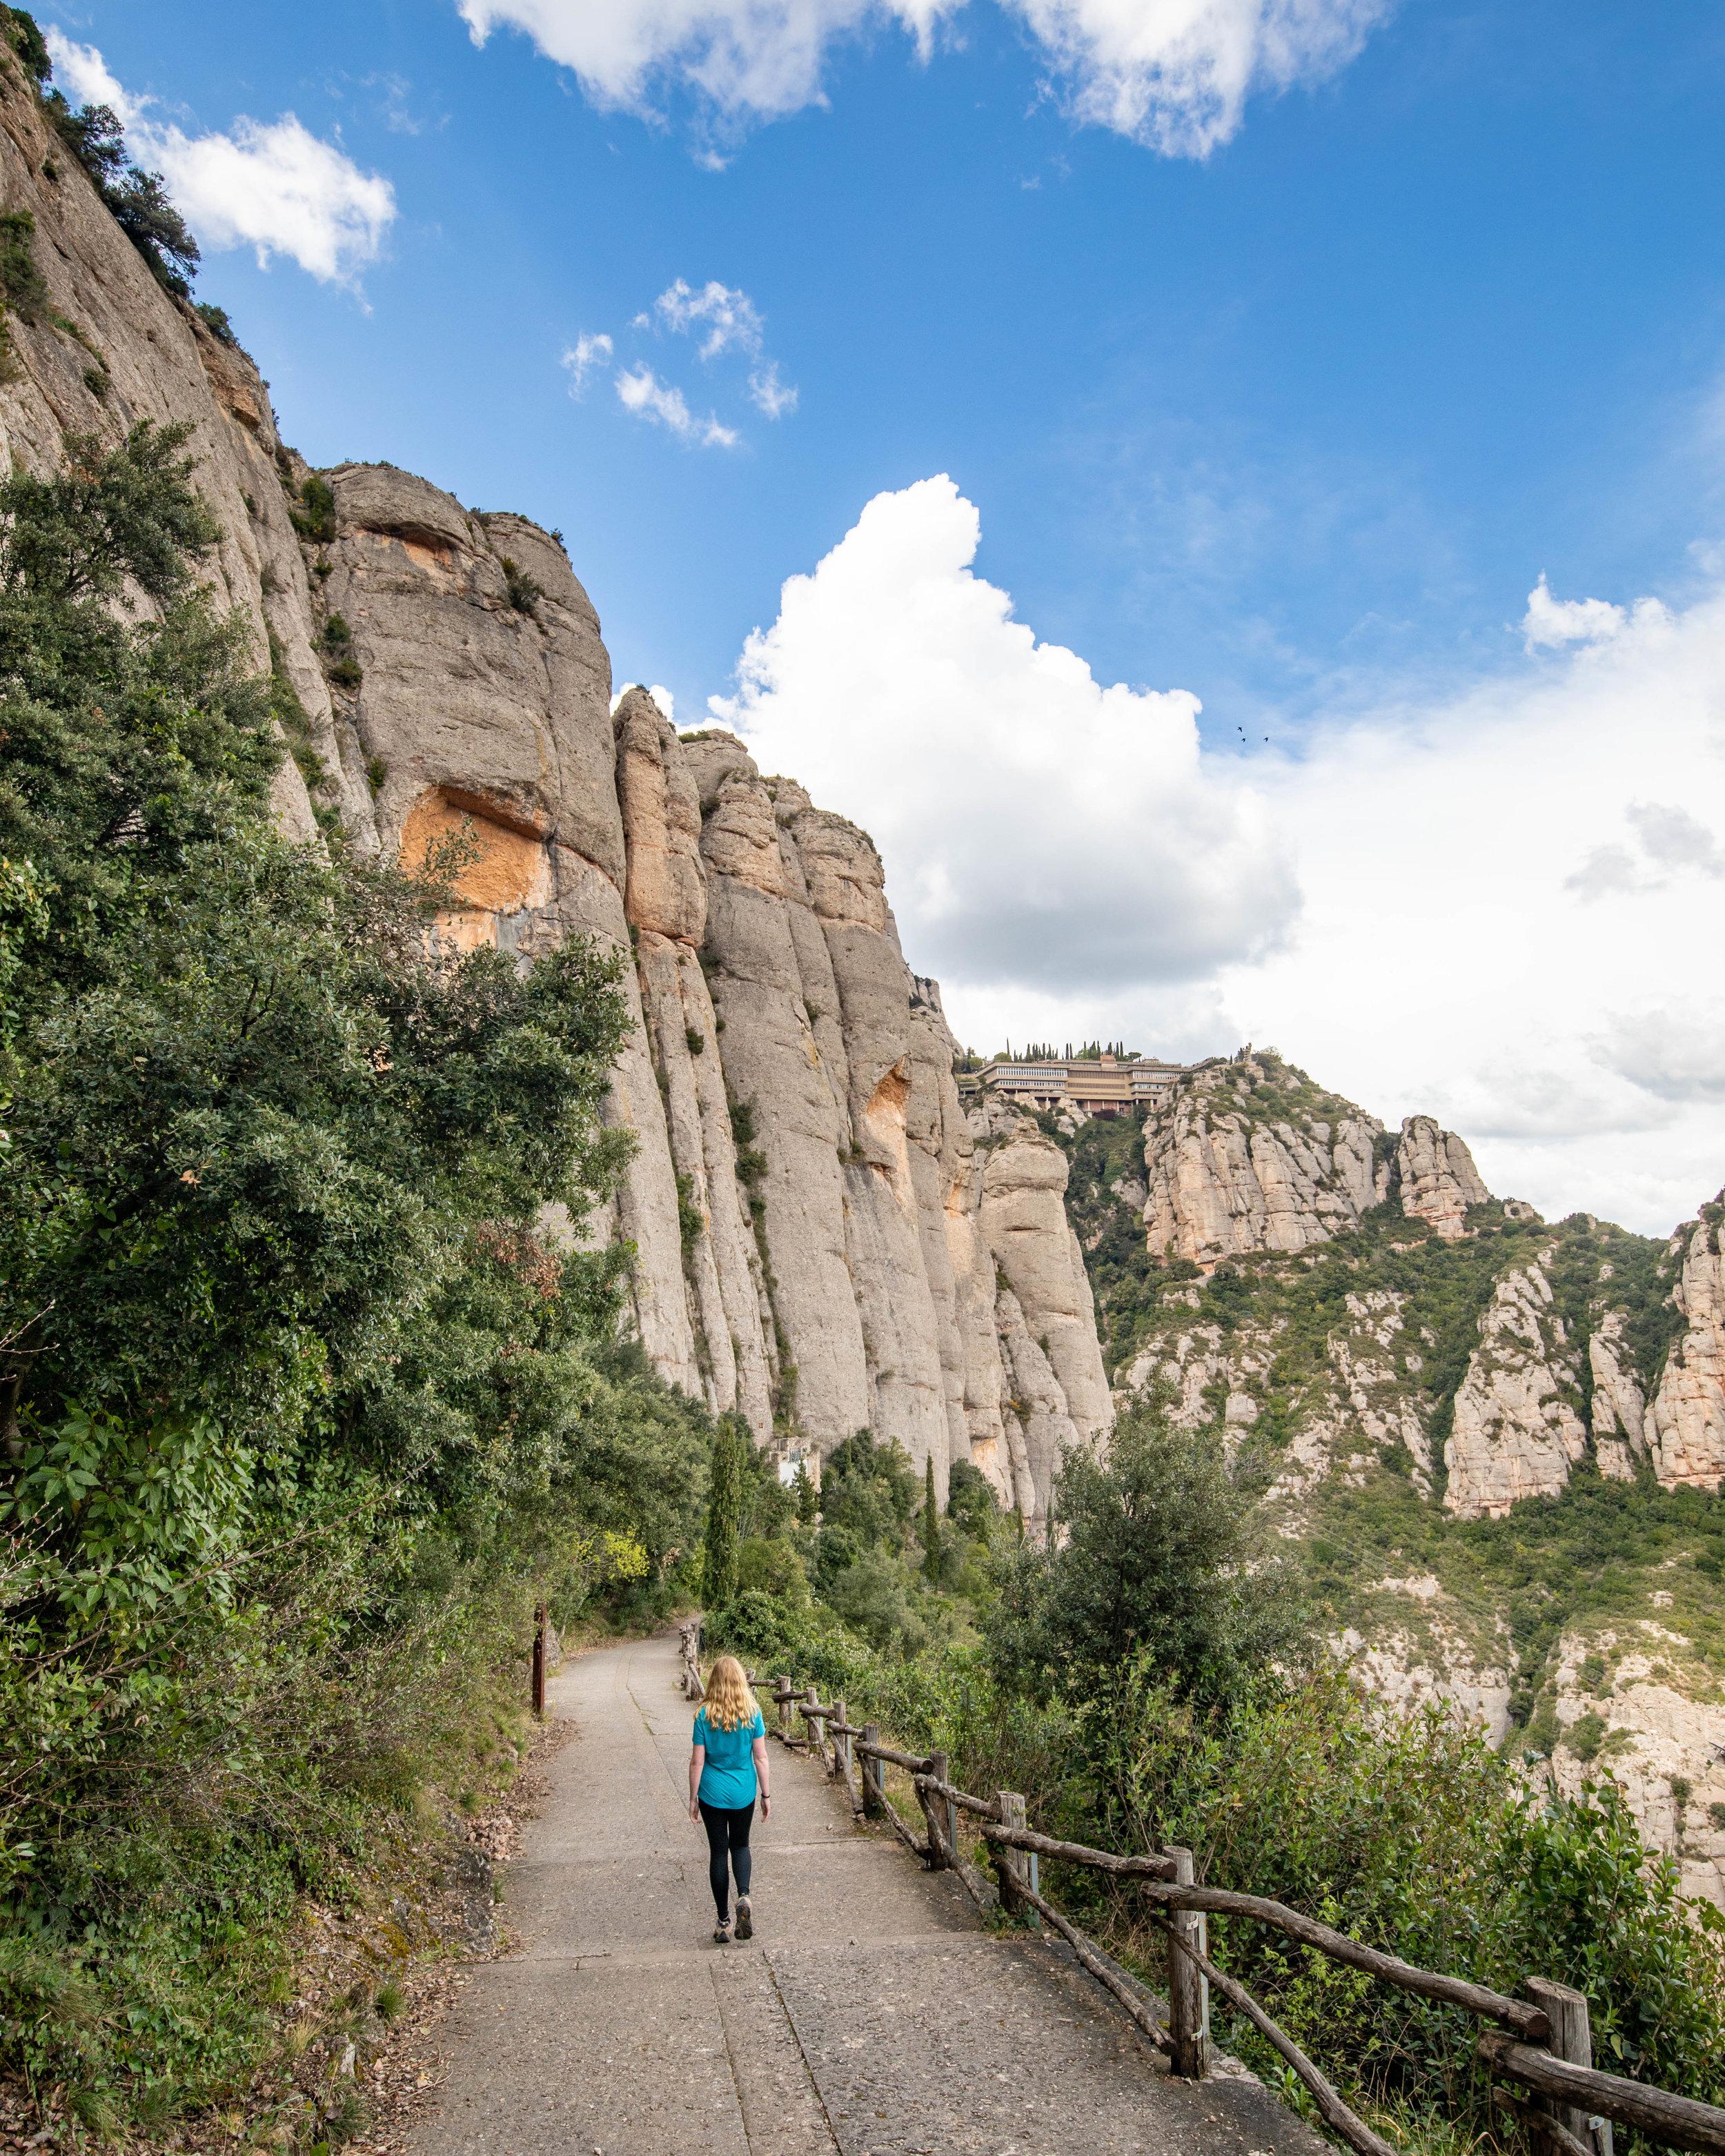 Hiking up Montserrat